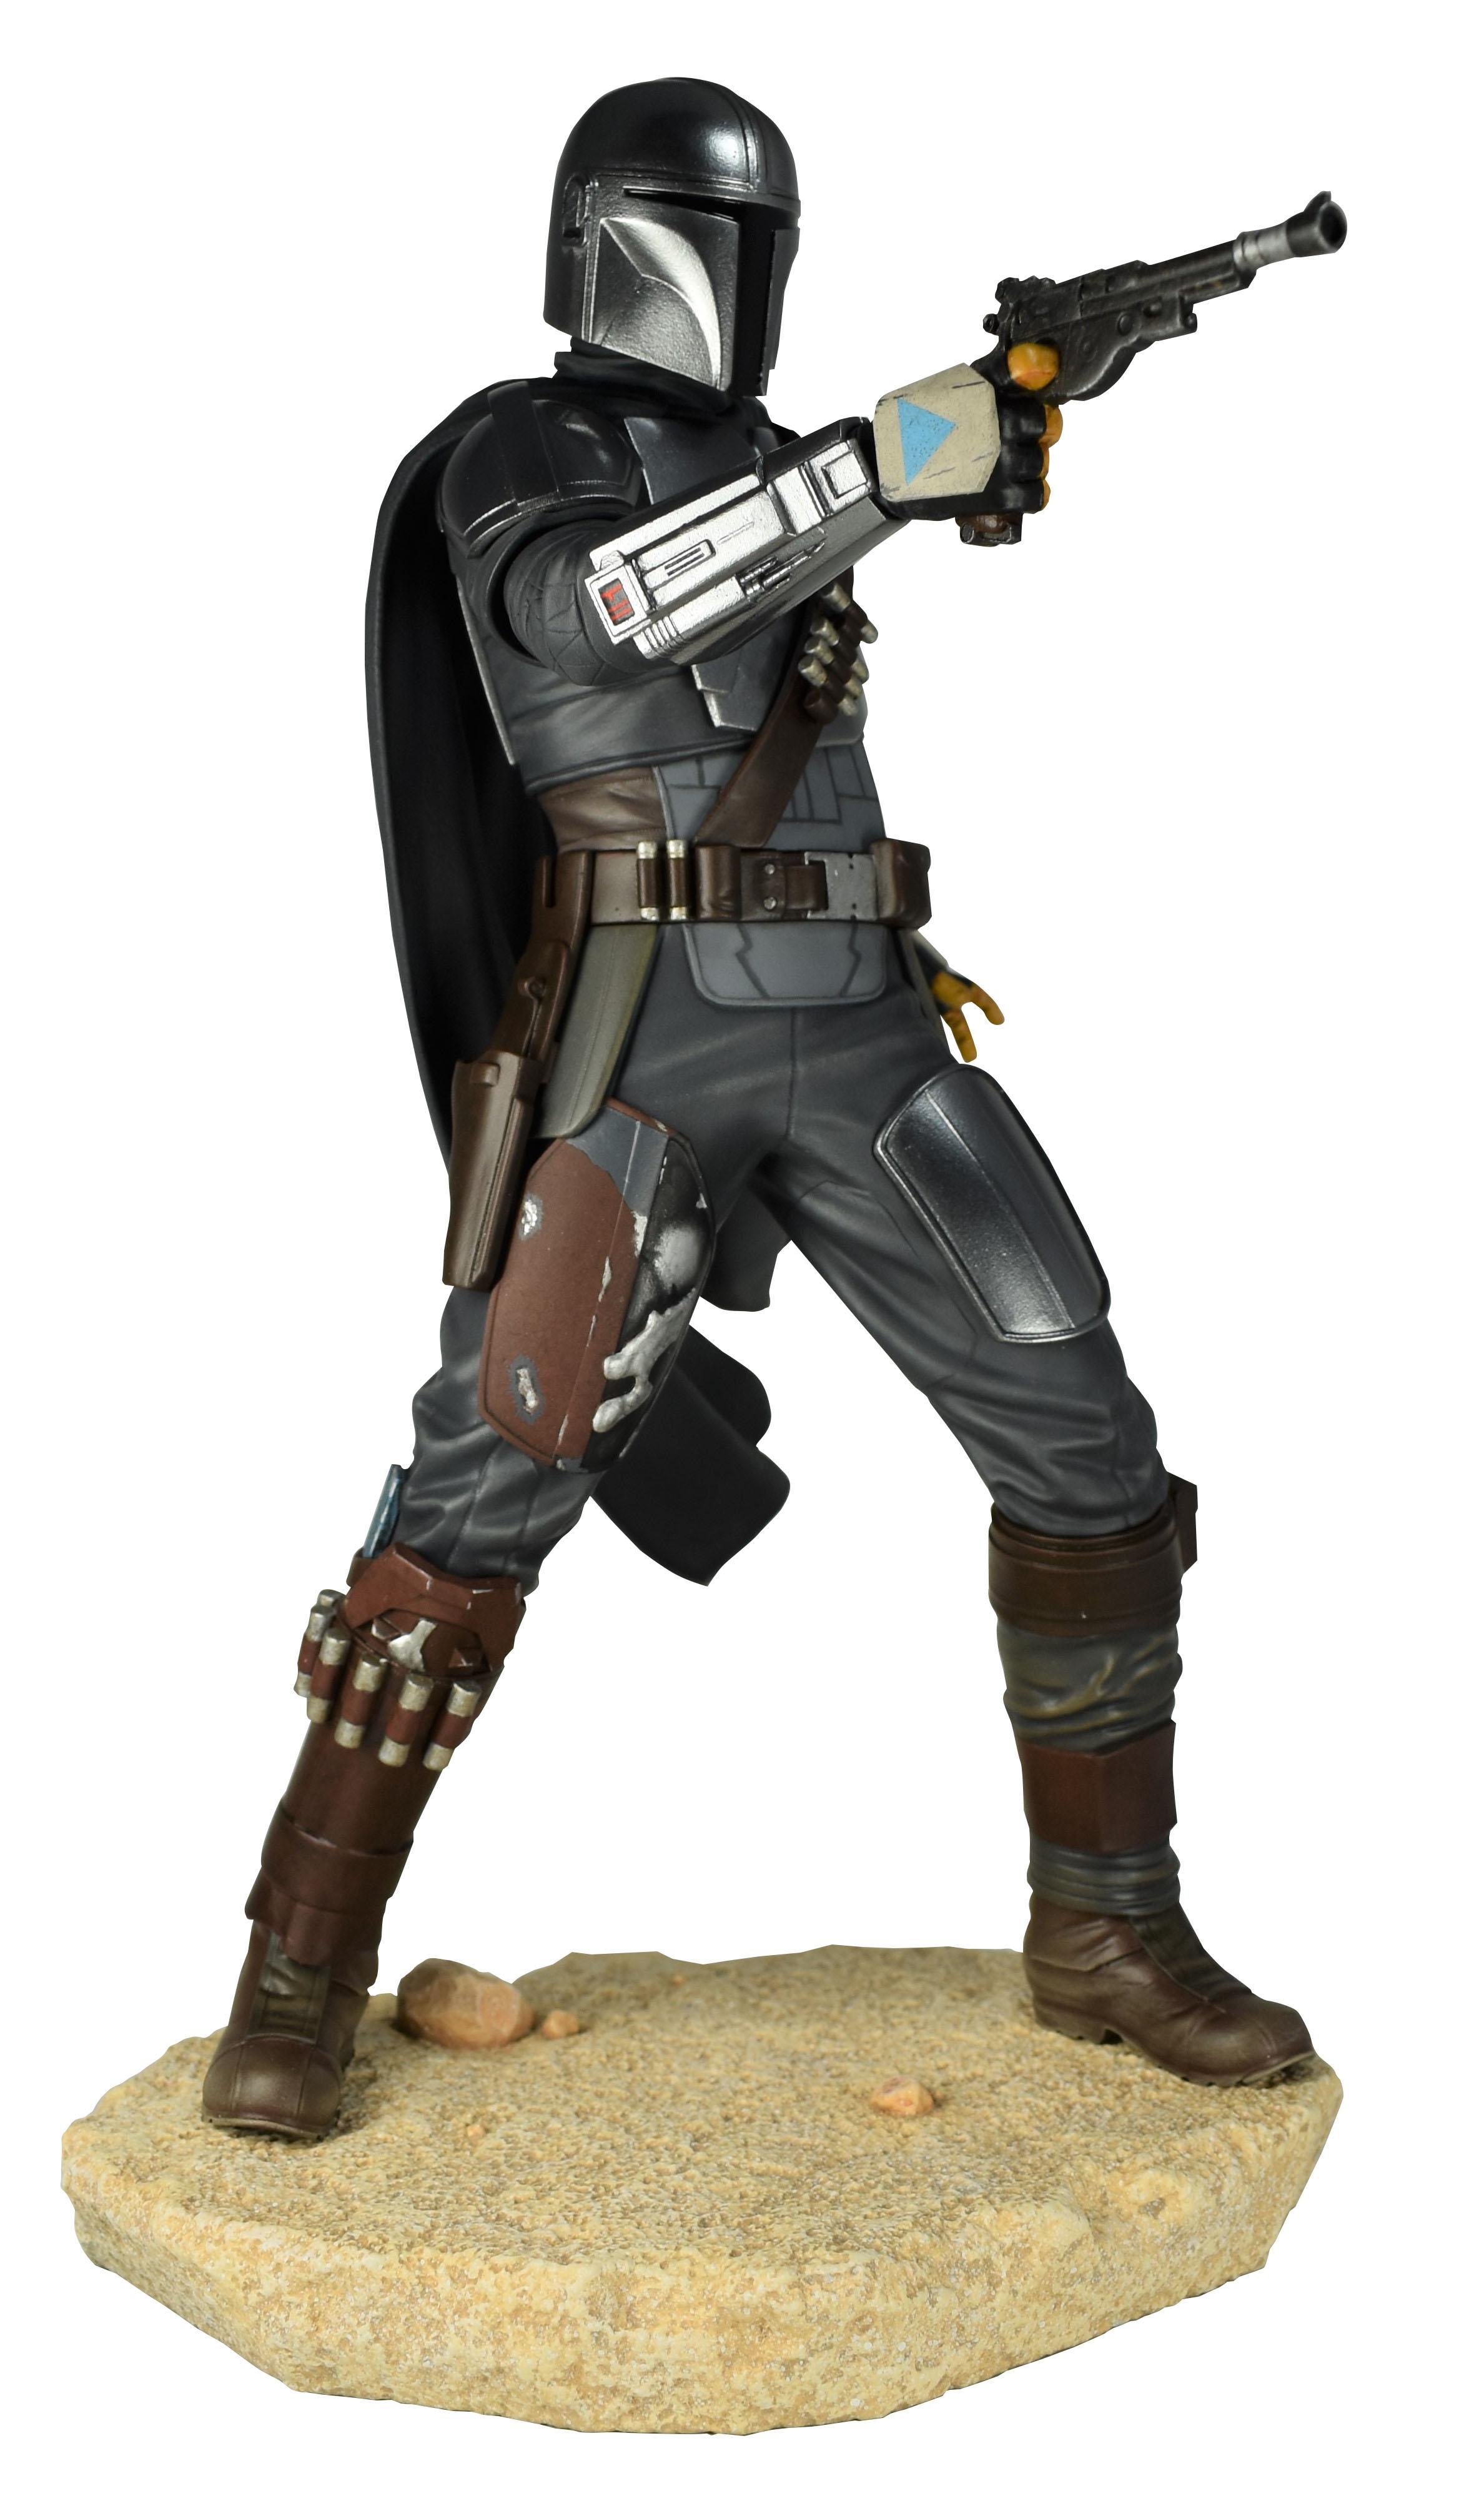 Star Wars Premier Collection - The Mandalorian Mk2 (Beskar Armor) Statue